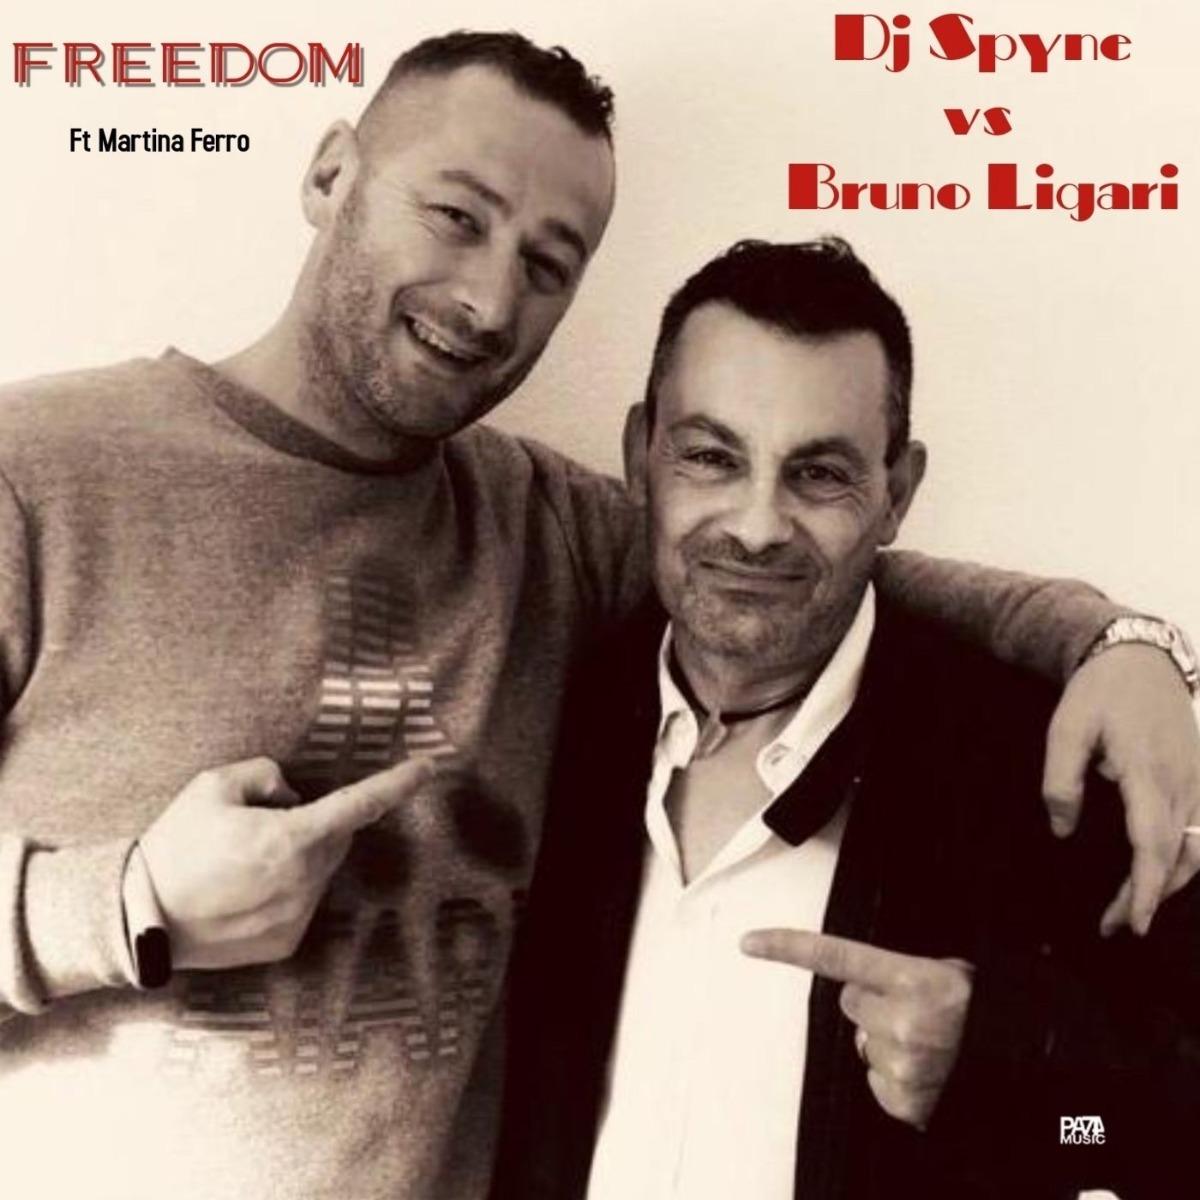 "Dj Spyne vs Bruno Ligari ""Freedom"" feat. Martina Ferro"